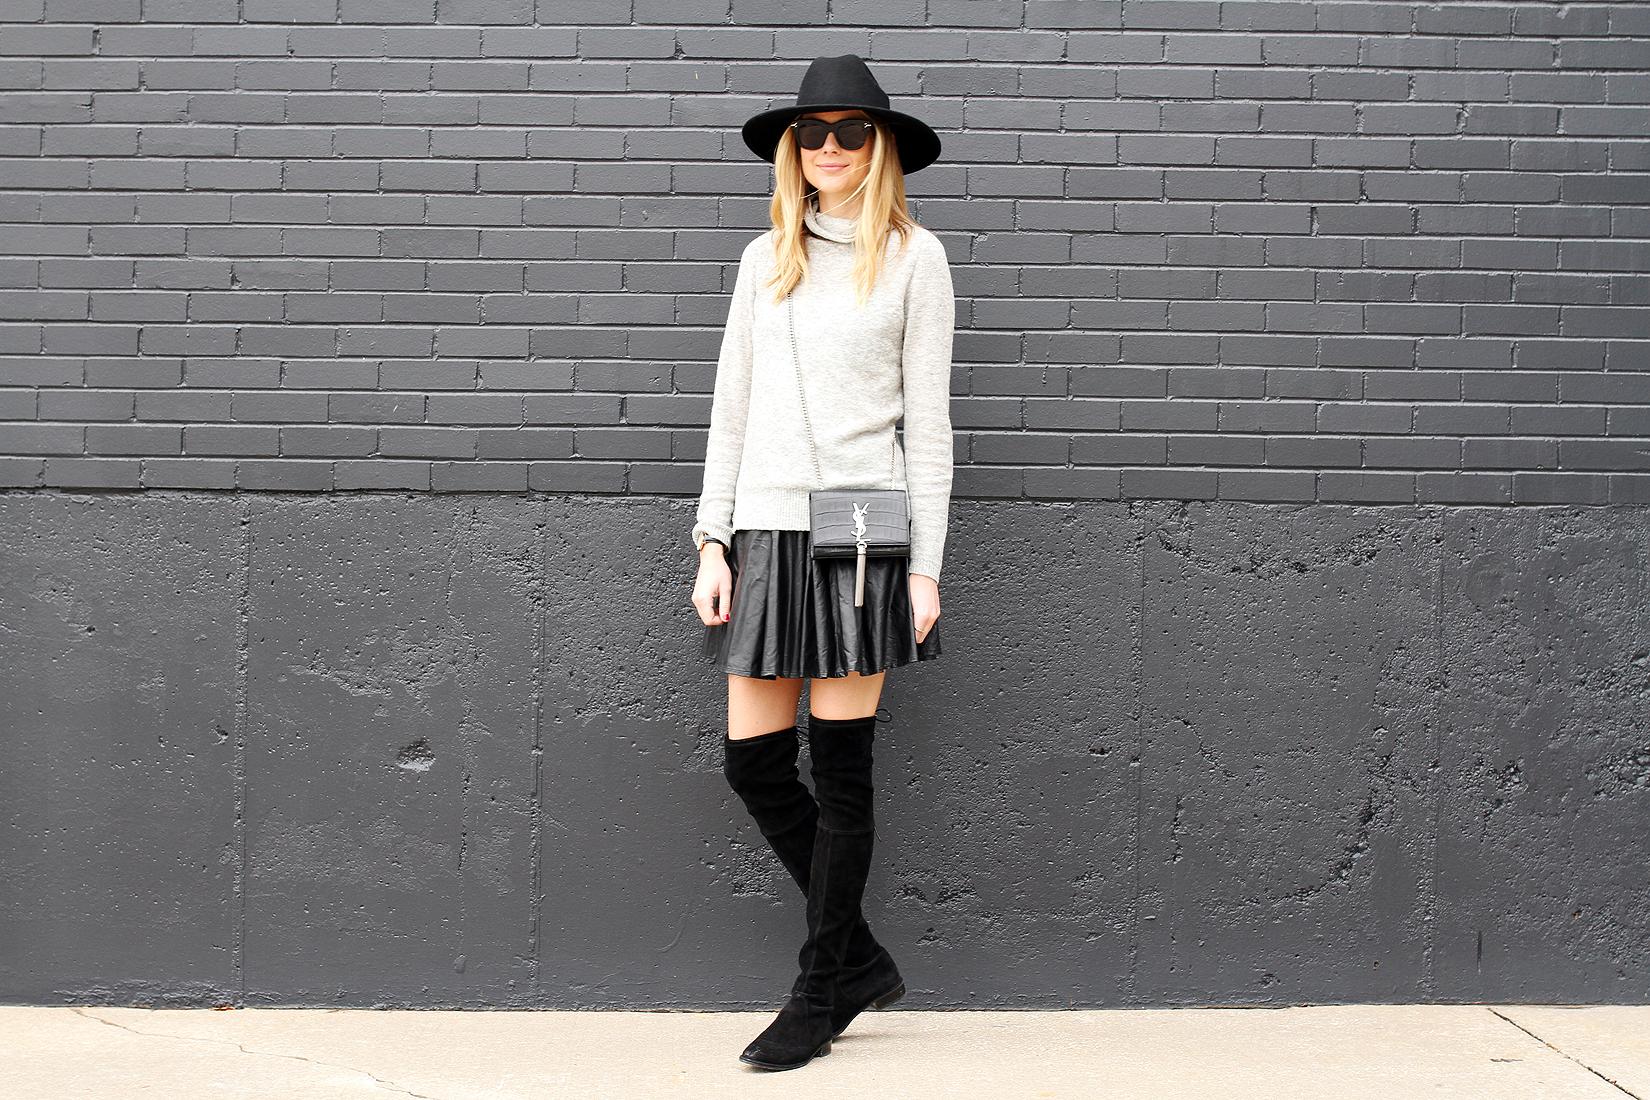 fashion-jackson-grey-sweater-black-pleated-skirt-black-otk-boots-black-wool-hat